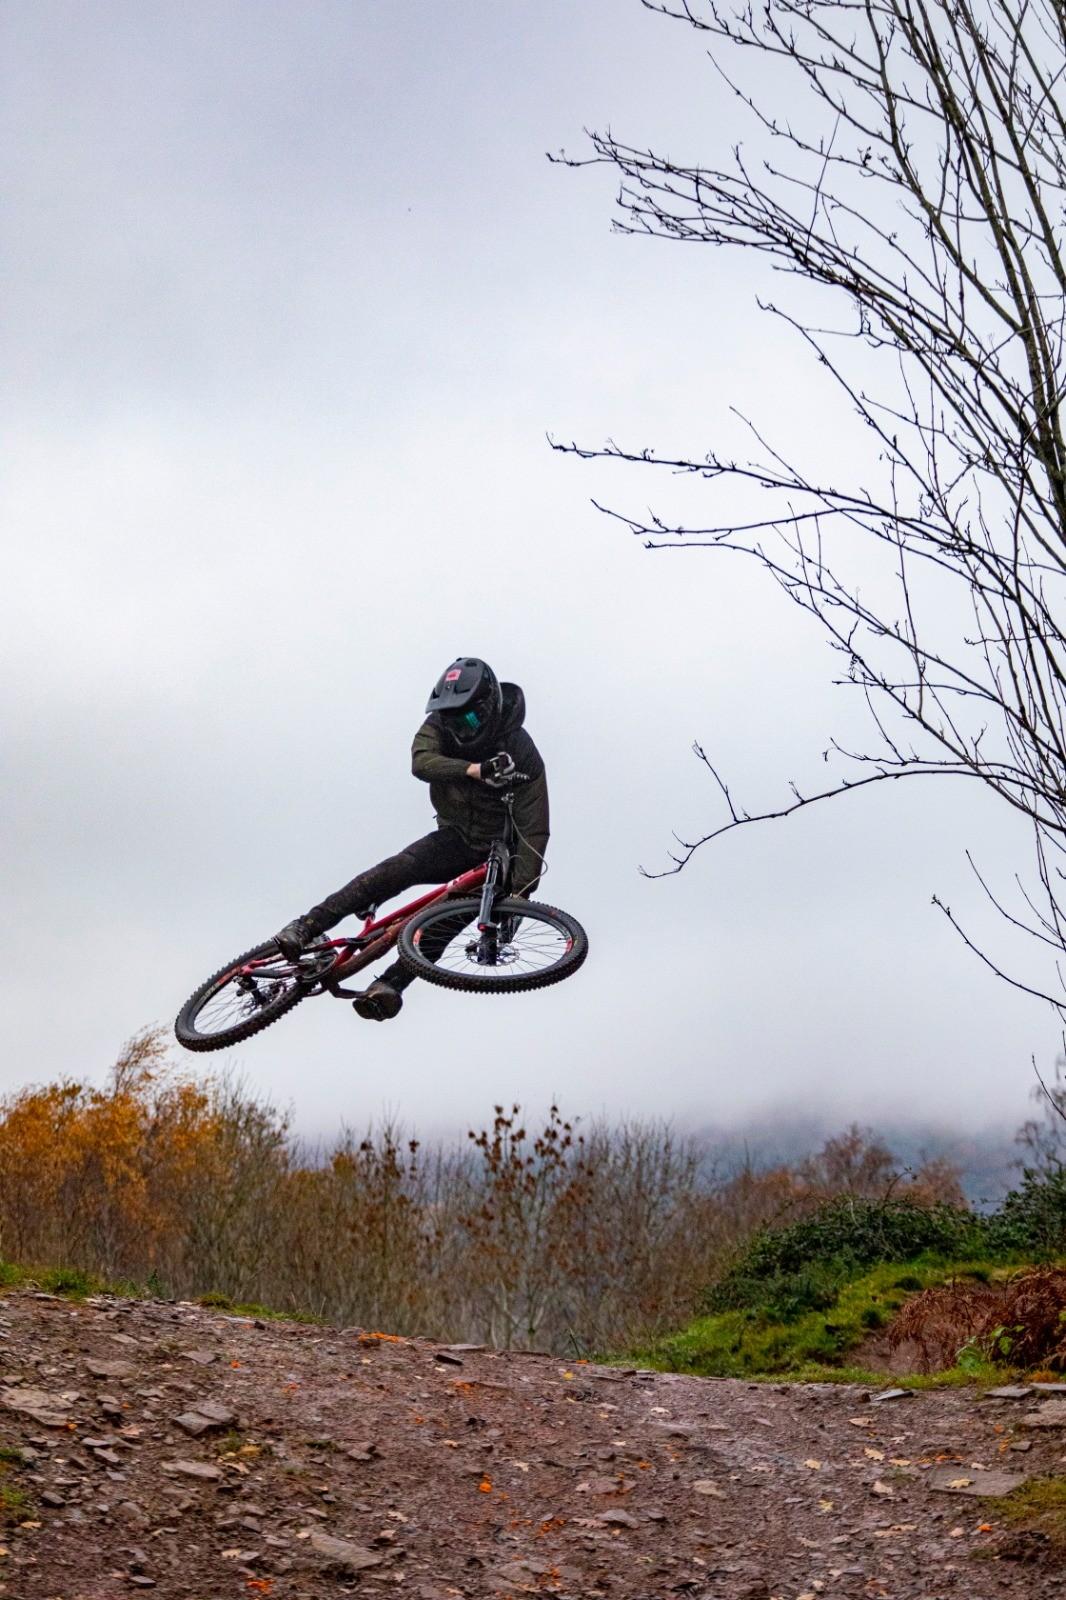 8A8A566B-9260-4ABB-A0A4-E6C042F56C88 - martin dunn - Mountain Biking Pictures - Vital MTB